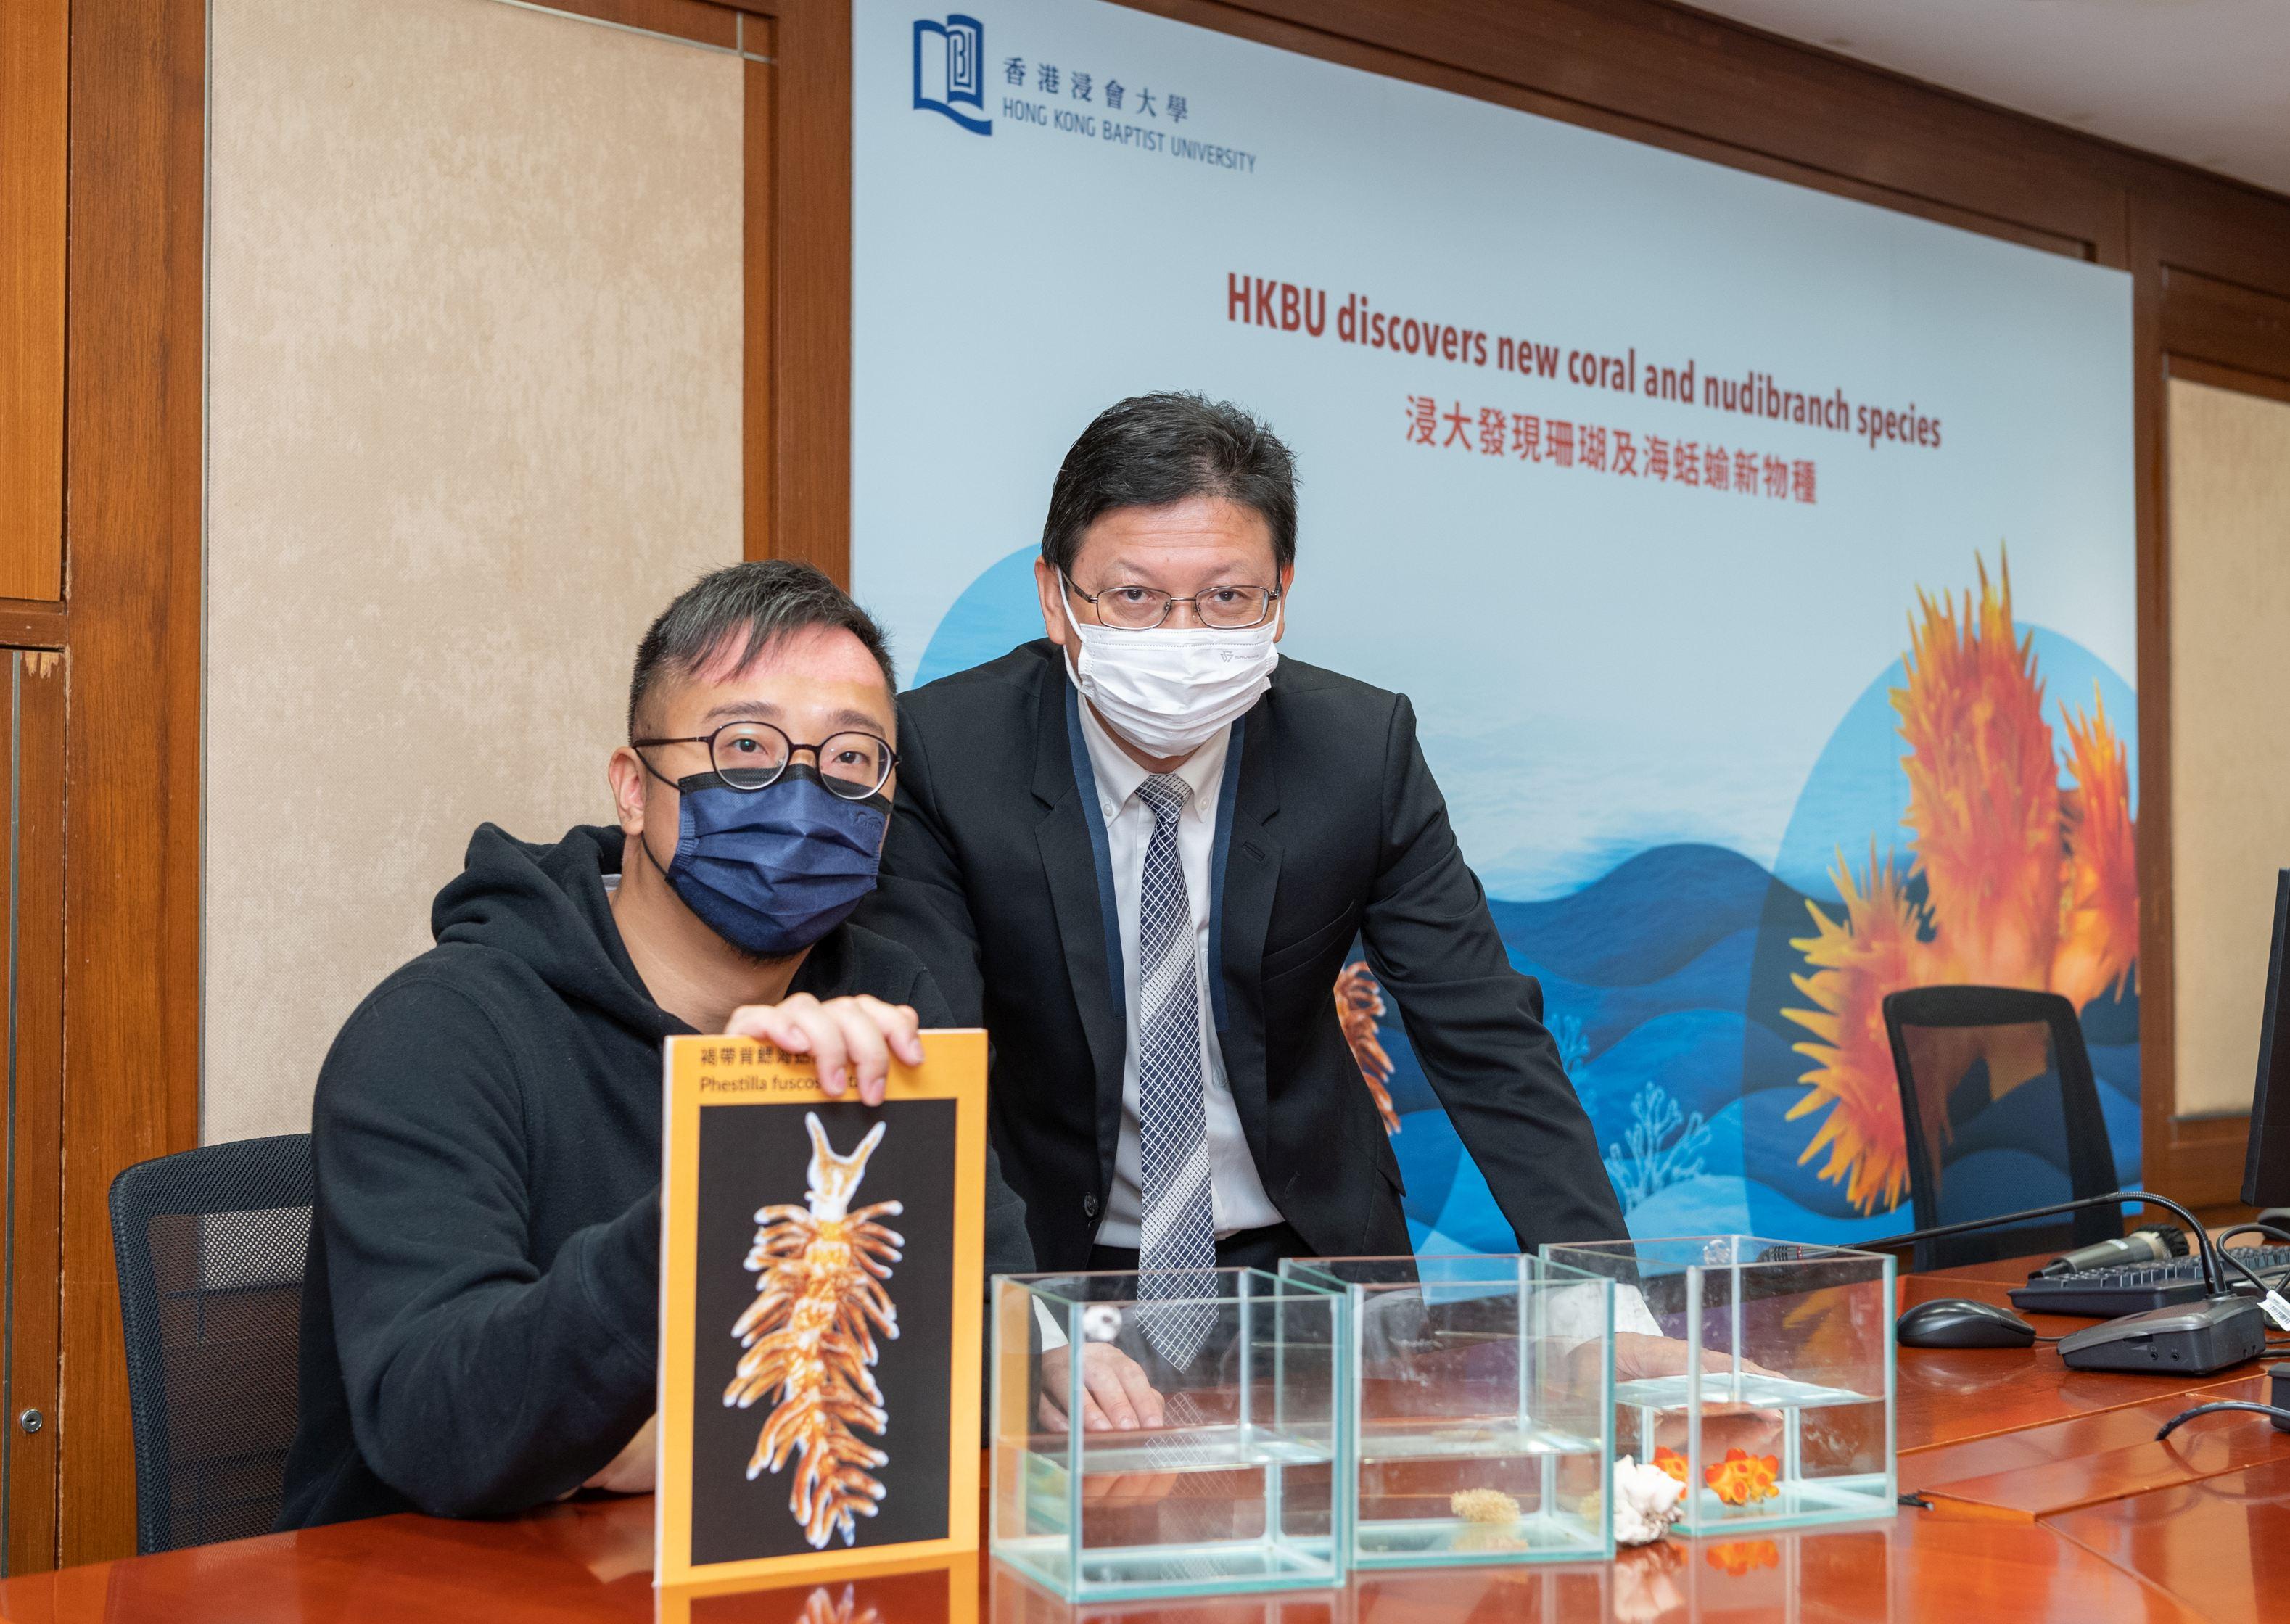 Hong Kong Baptist Universitys discovery of new coral and nudibranch species reflects Hong Kongs rich marine biodiversity